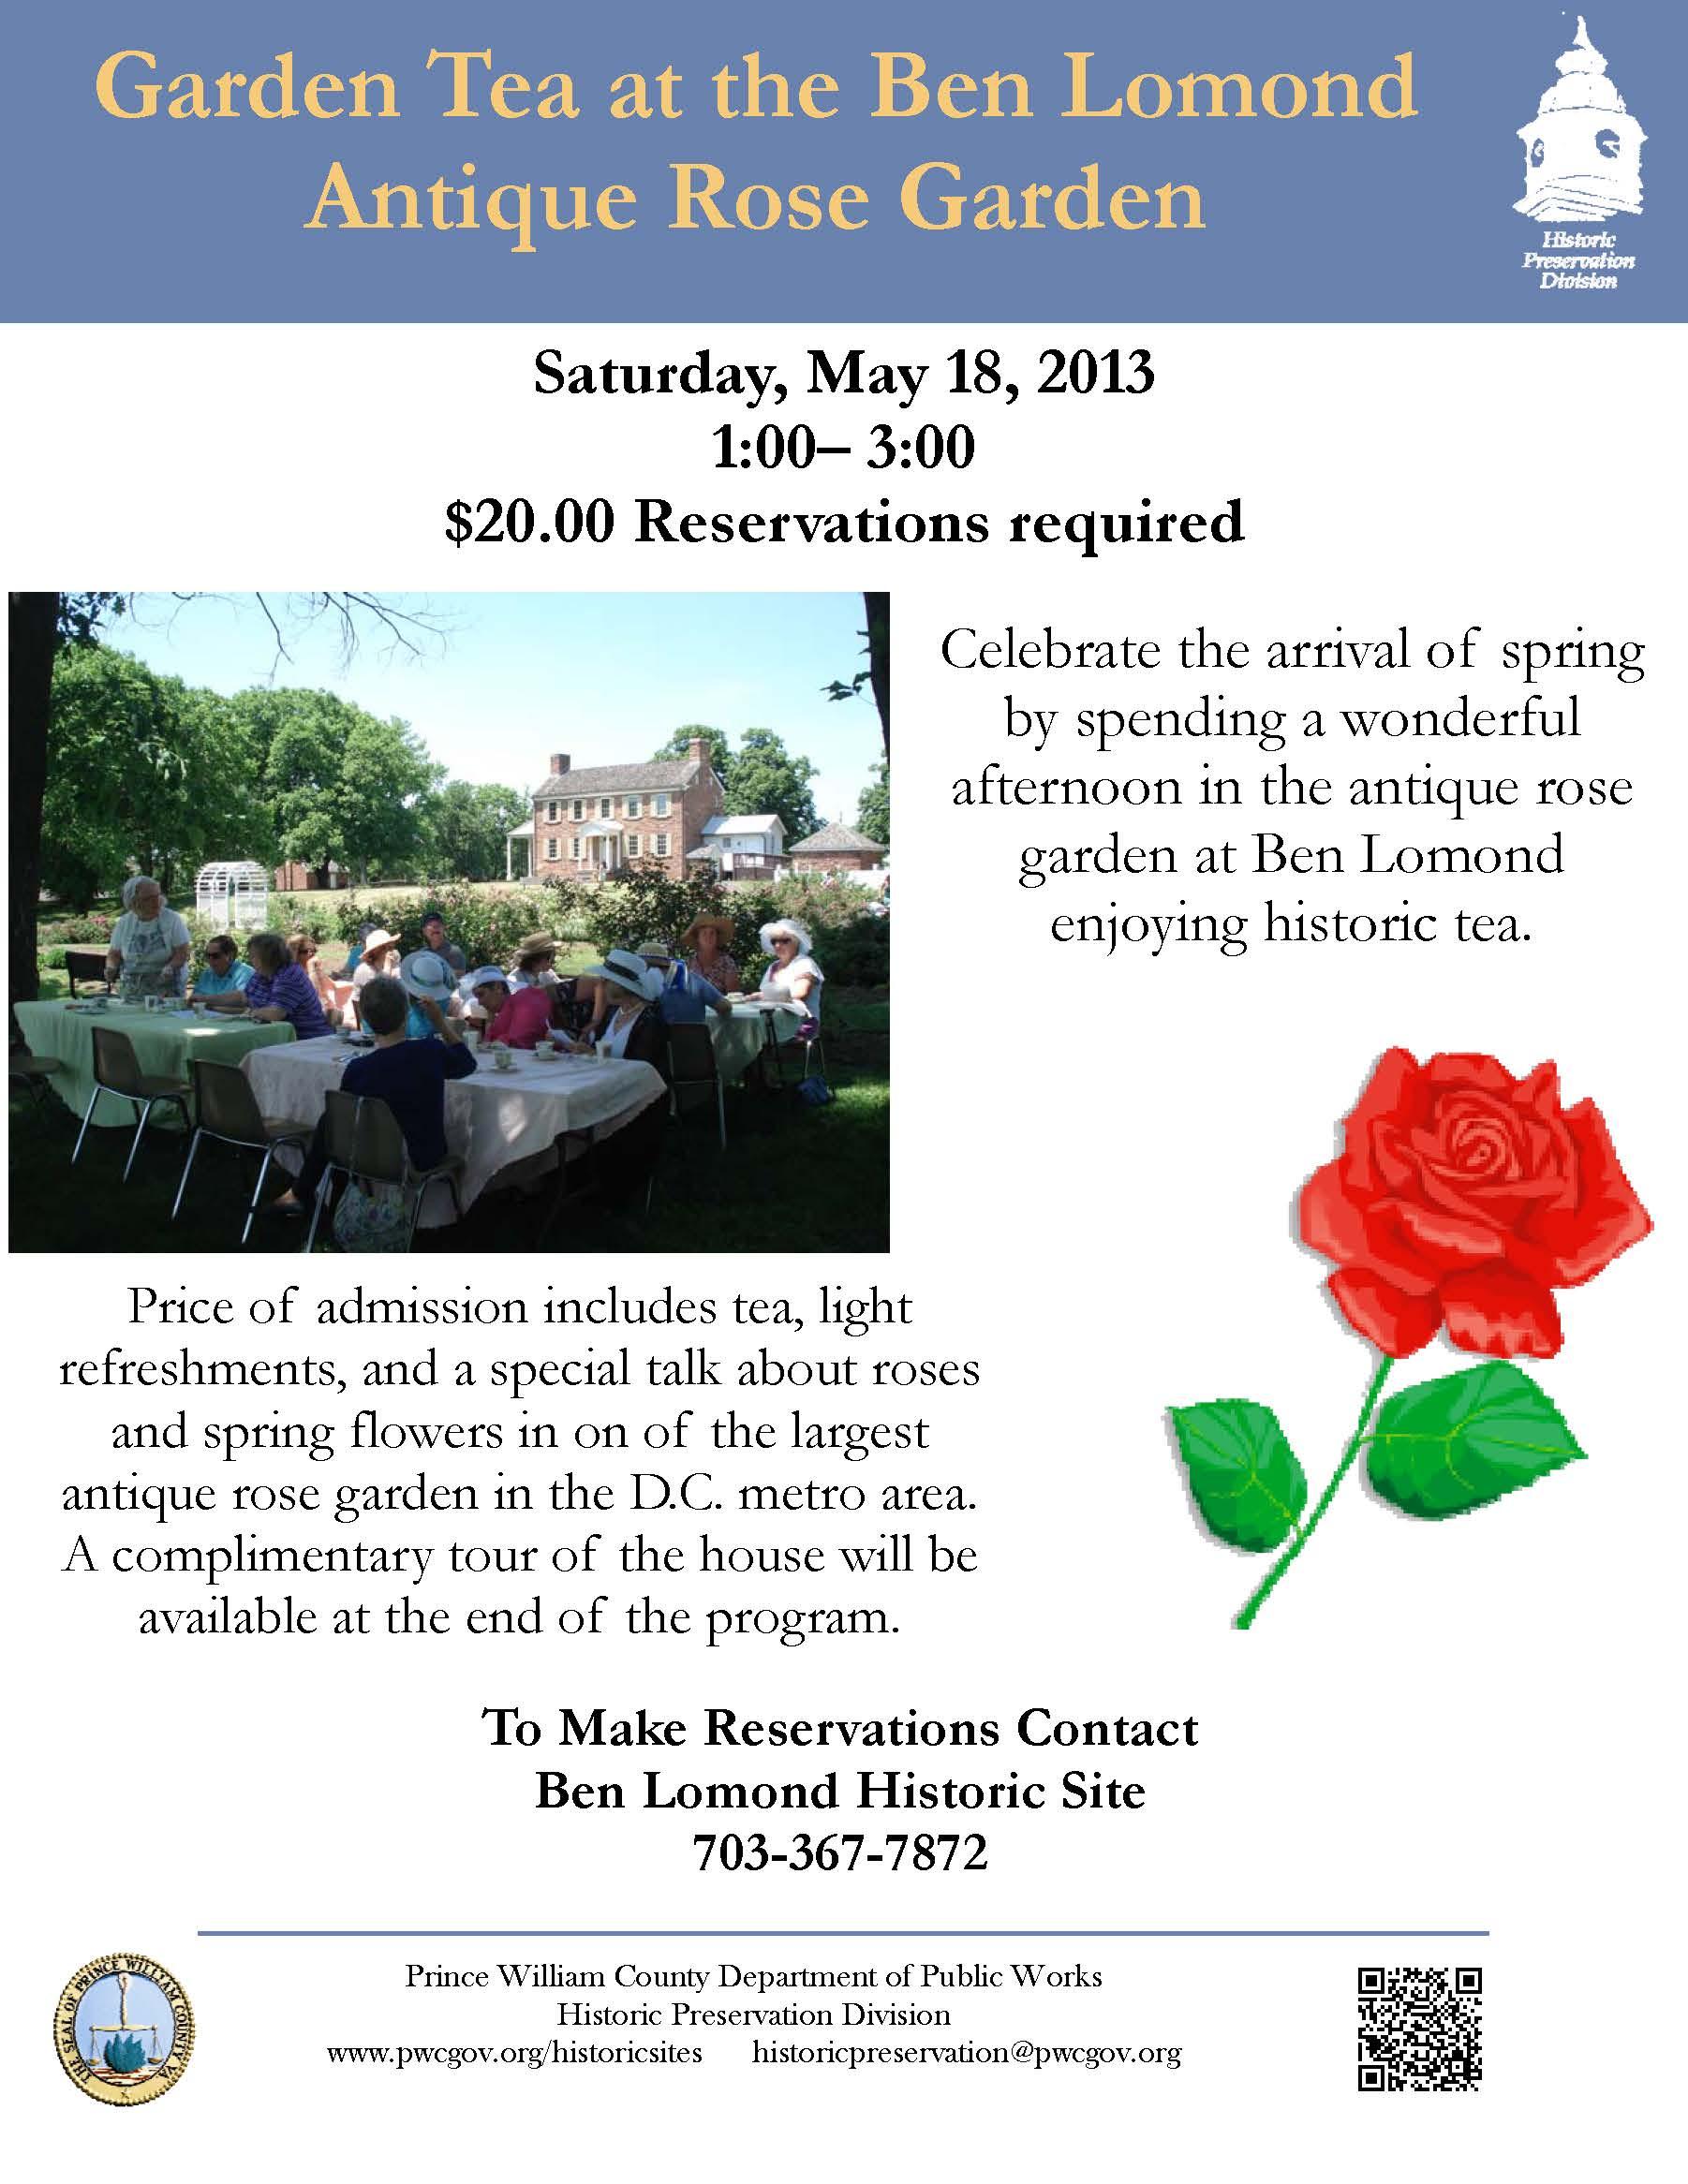 Garden tea flyer 5.18.13